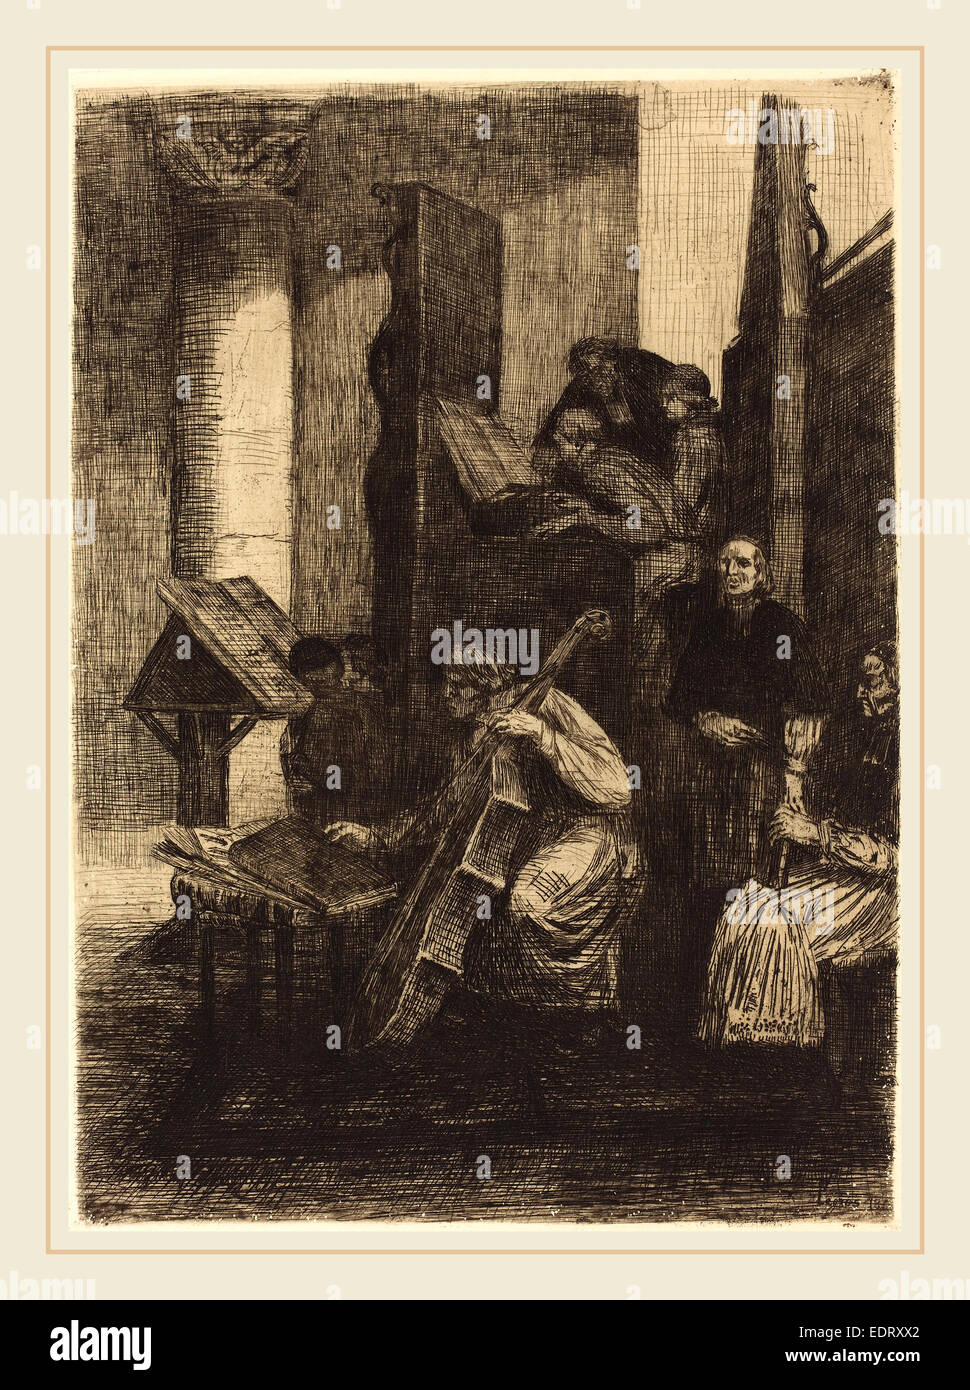 Alphonse Legros (French, 1837-1911), Choir in a Spanish Church (Le choeur d'une eglise espagnole), 1860, etching - Stock Image